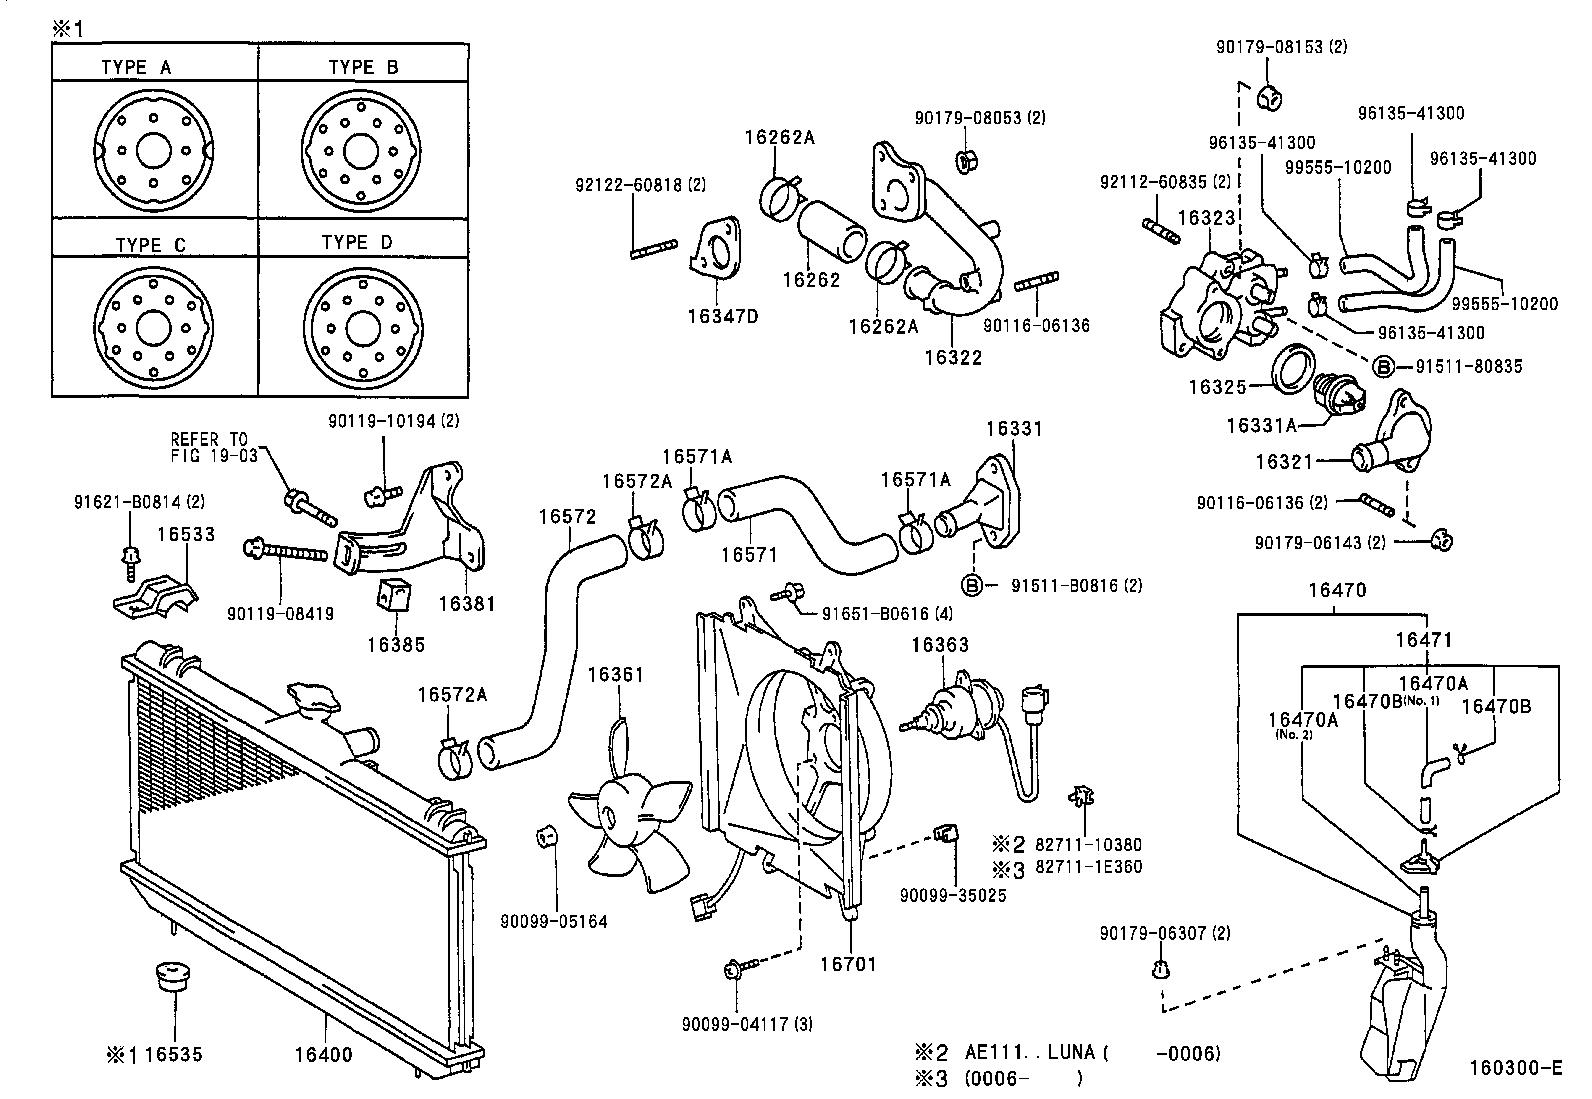 1990 dodge dynasty wiring diagram gc 3804  1989 chrysler lebaron auto wiring diagram schematic free  1989 chrysler lebaron auto wiring